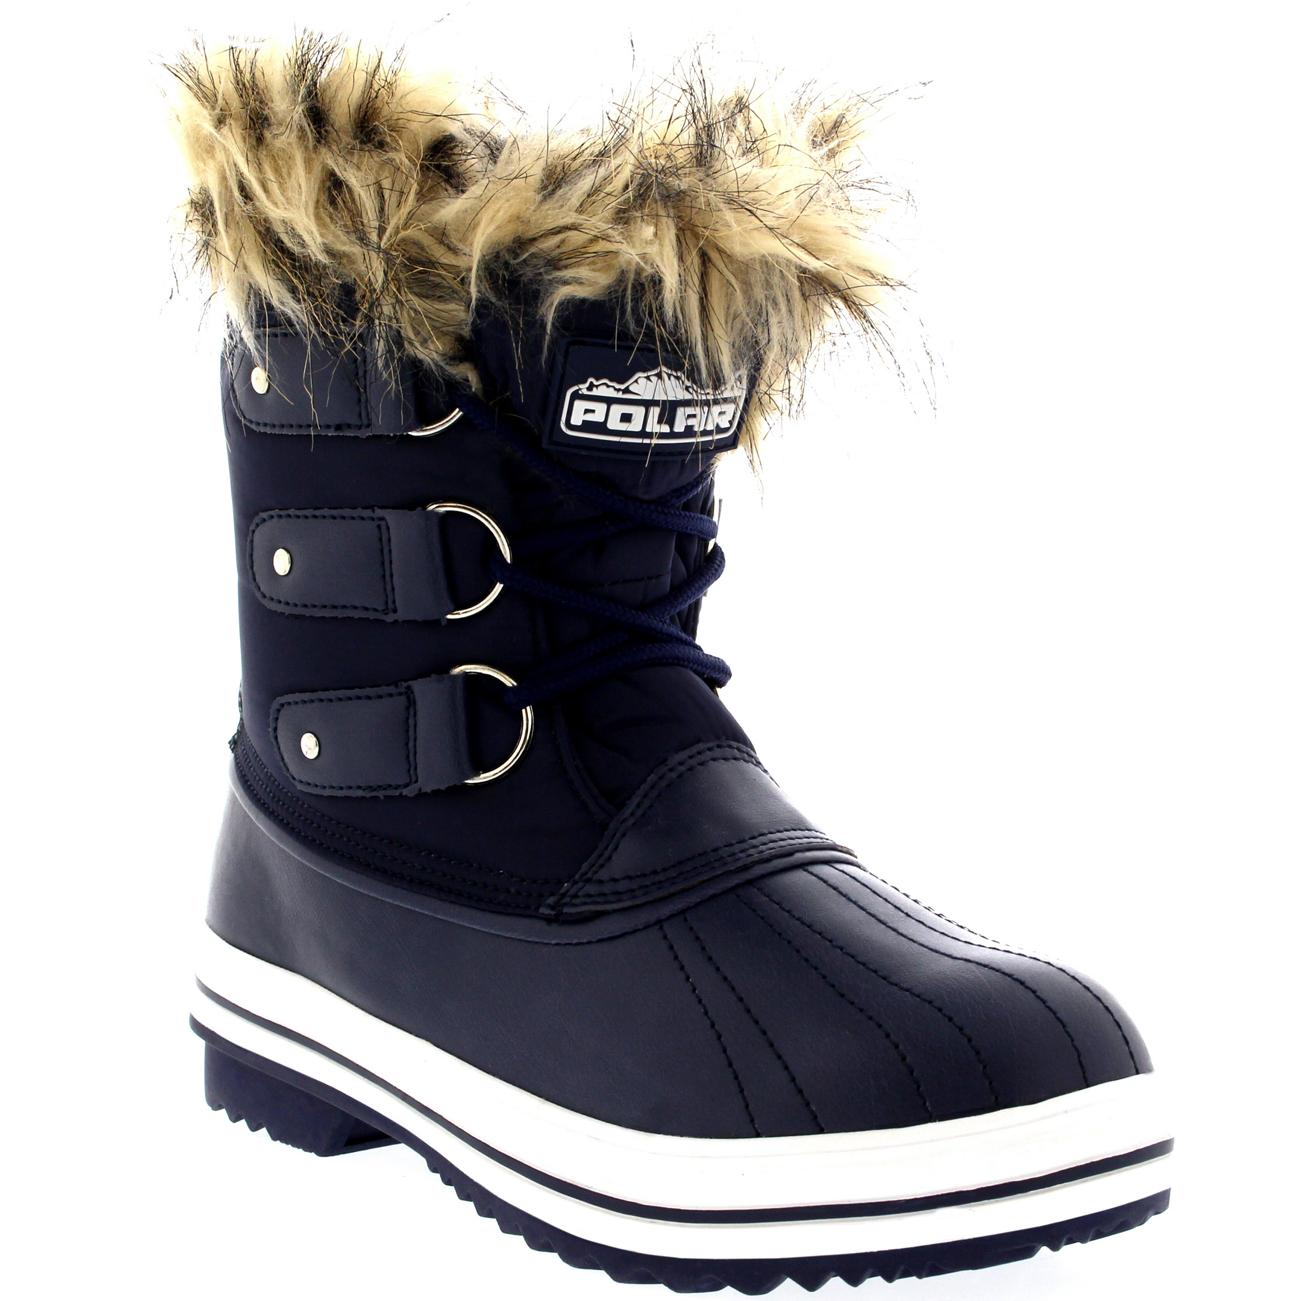 Womens Short Snow Boots | Homewood Mountain Ski Resort